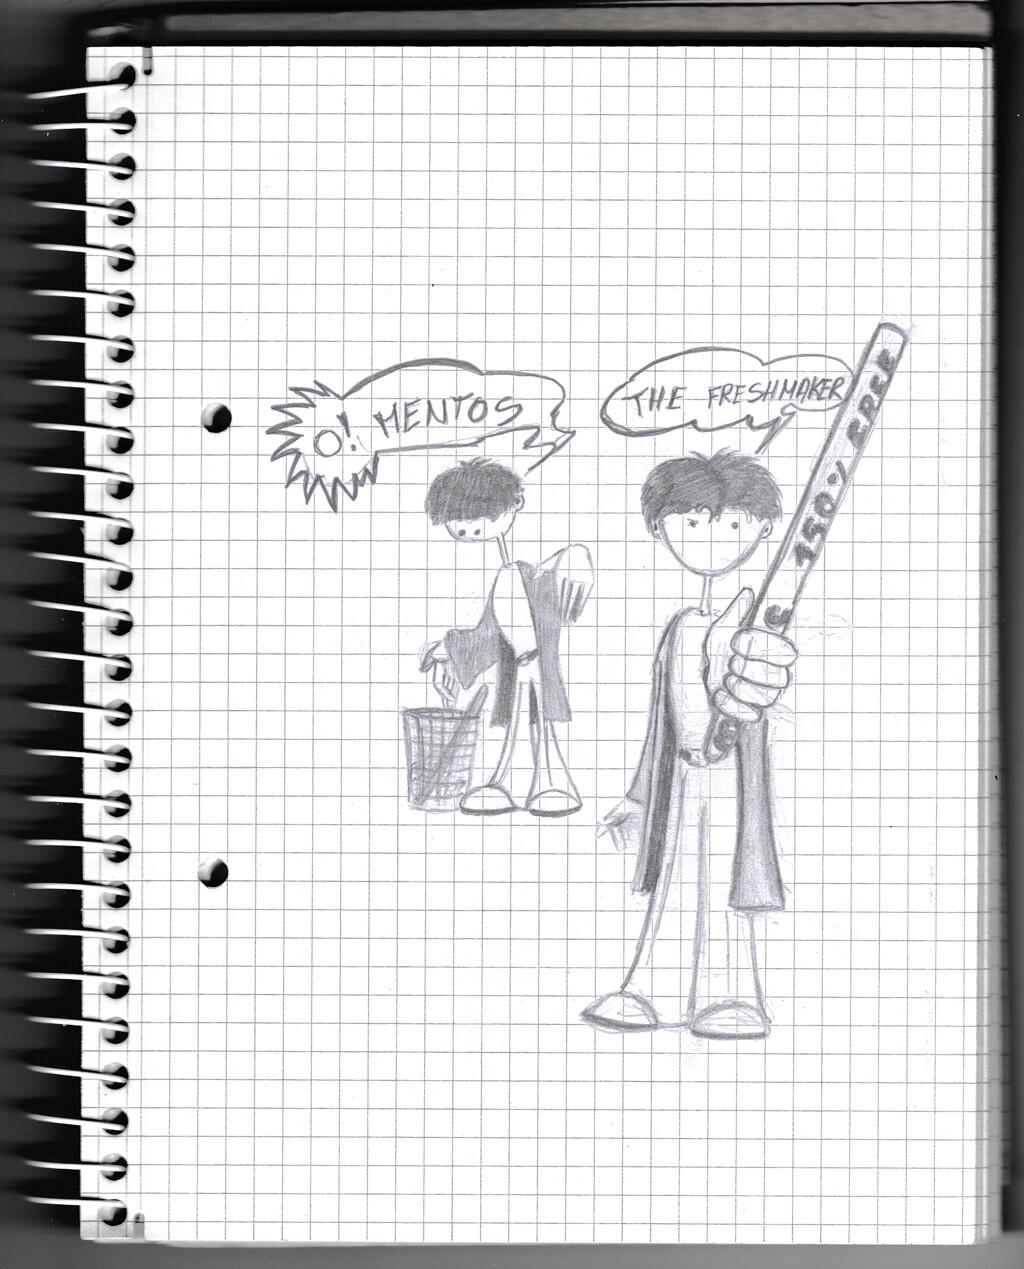 character, sketch, pencil,